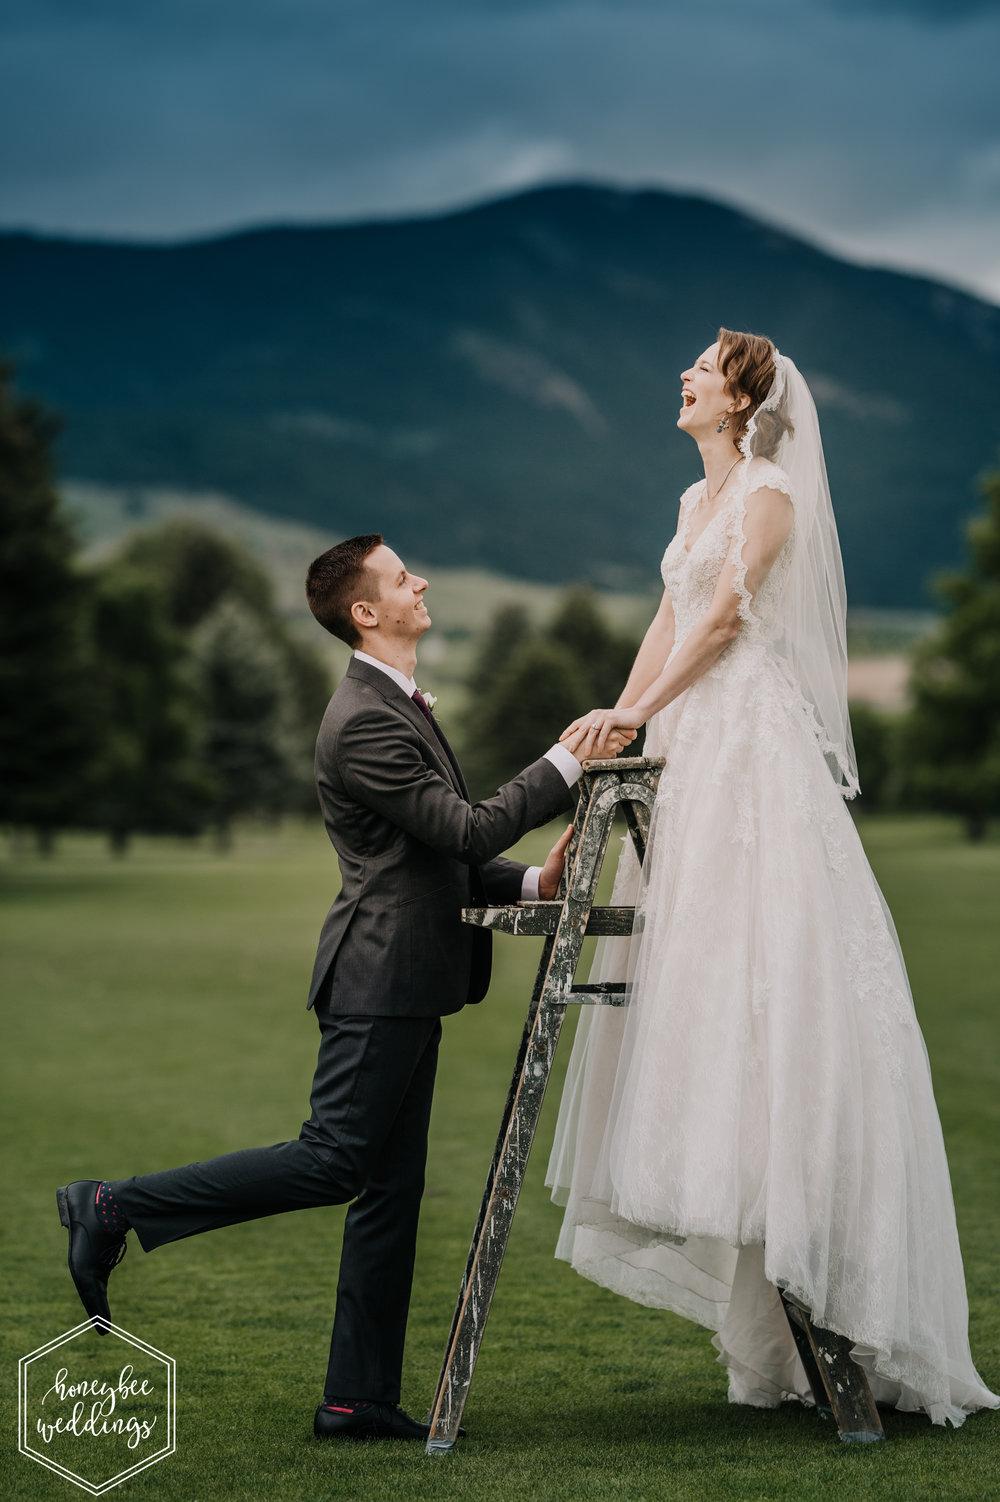 793 Riverside Country Club Wedding_Montana Wedding Photographer_Lauren Jackson + Evan Ivaldi 2018-6794.jpg